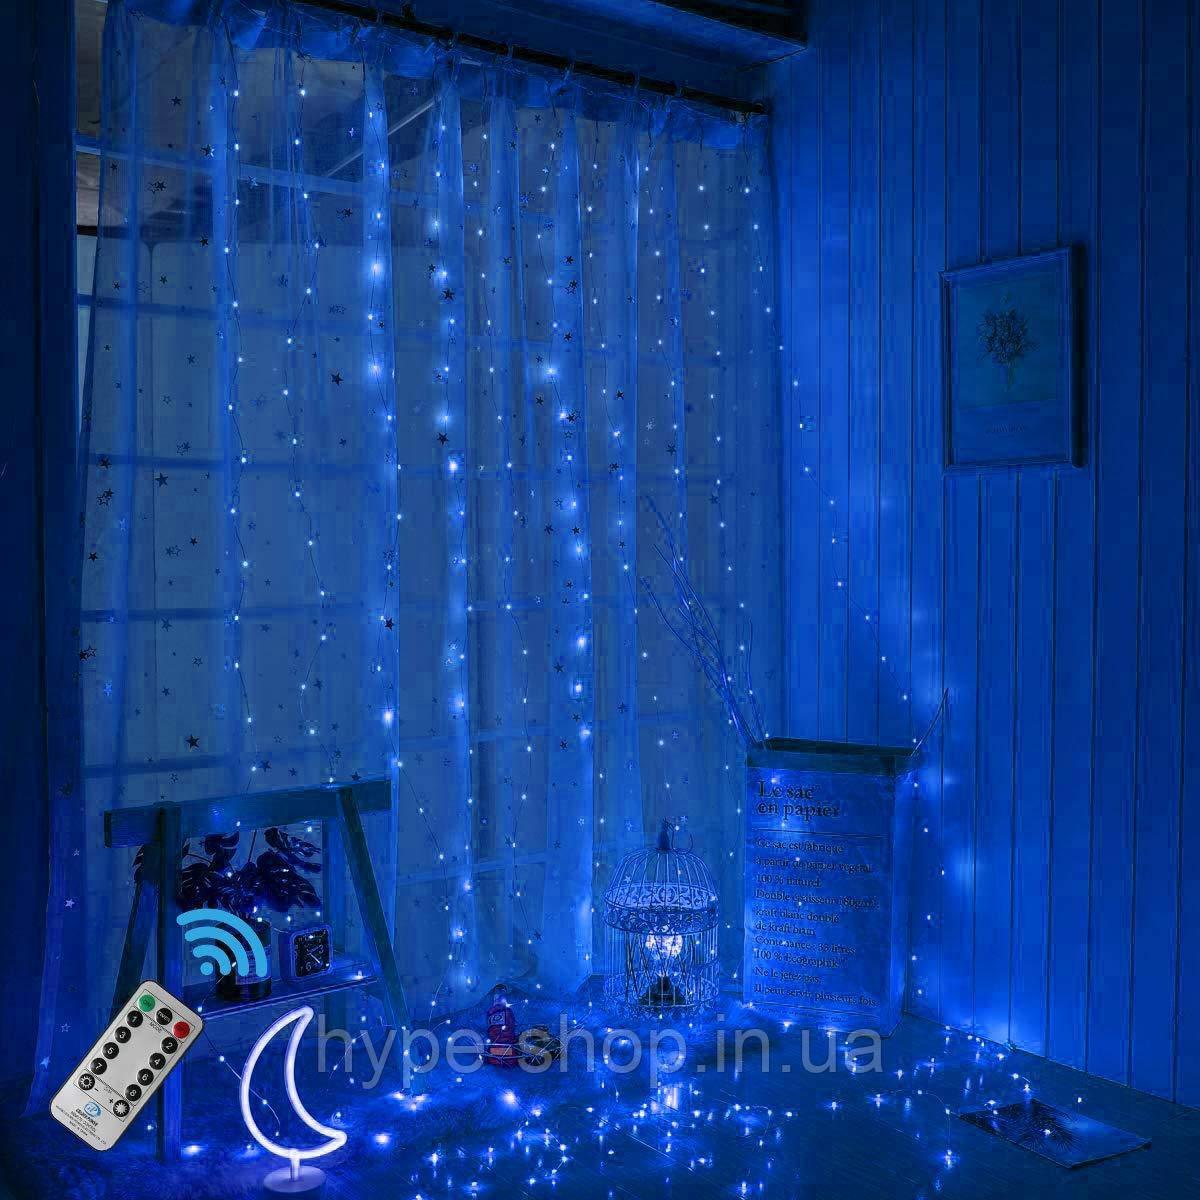 Светодиодная гирлянда LTL iтора Curtain Капля росы размер 3х3 метра 300 led 220v c пультом Blue/Синий